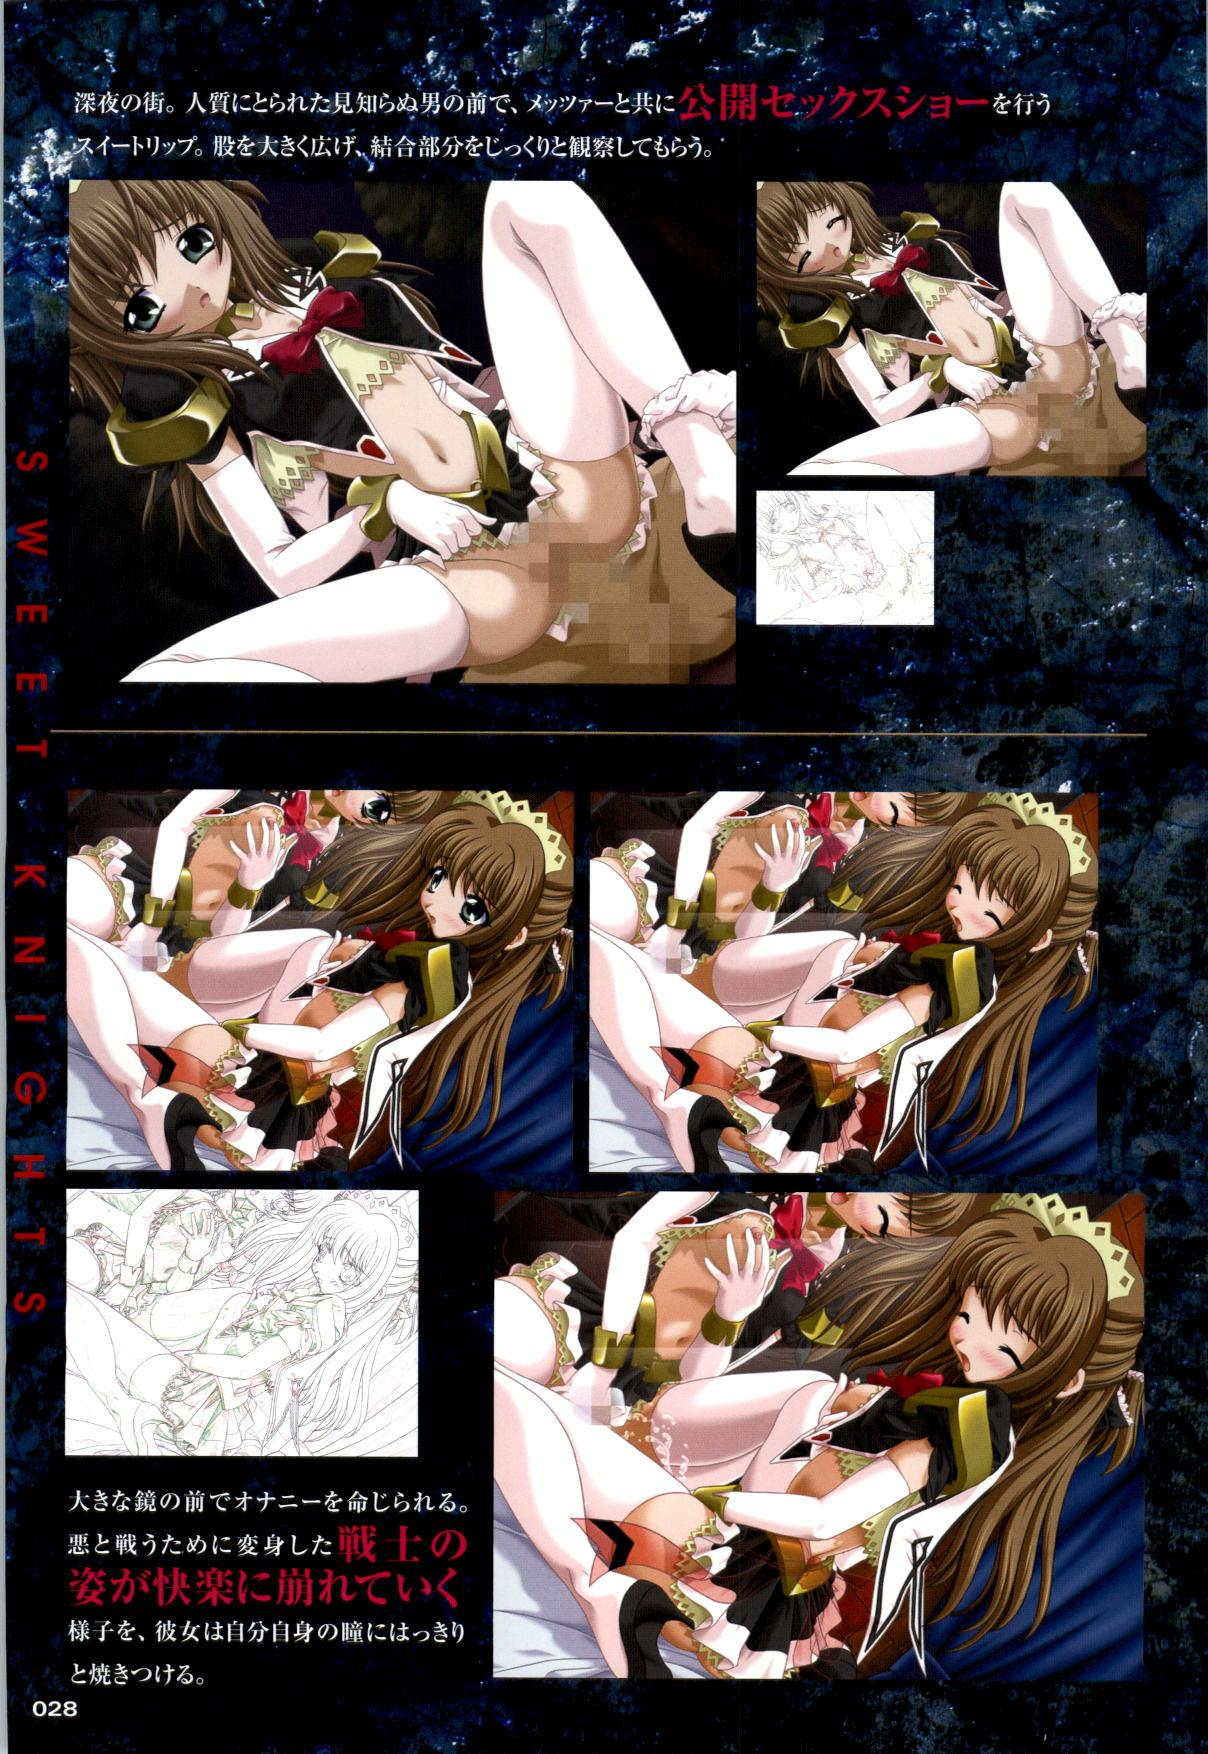 Mahou Senshi Sweet Knight & Mahou Senshi Princess Tear 27